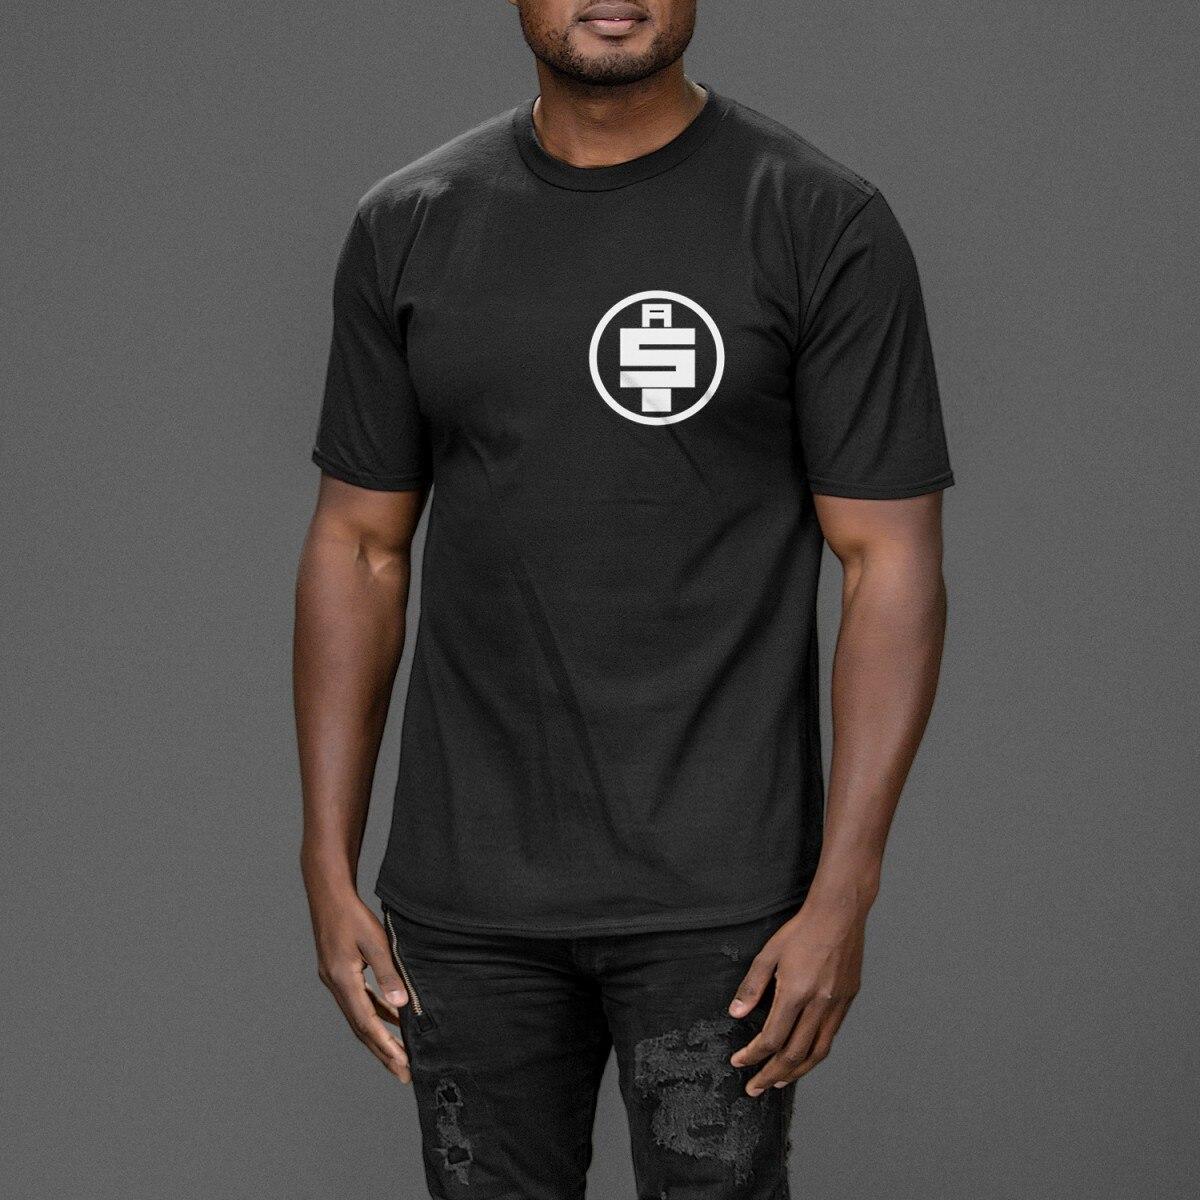 Men Clothes 2019 Nipsey Hussle T-Shirts Summer Short Sleeve Cool Top Hip-hop Tees Shirt Casual Loose New Cotton T Shirts